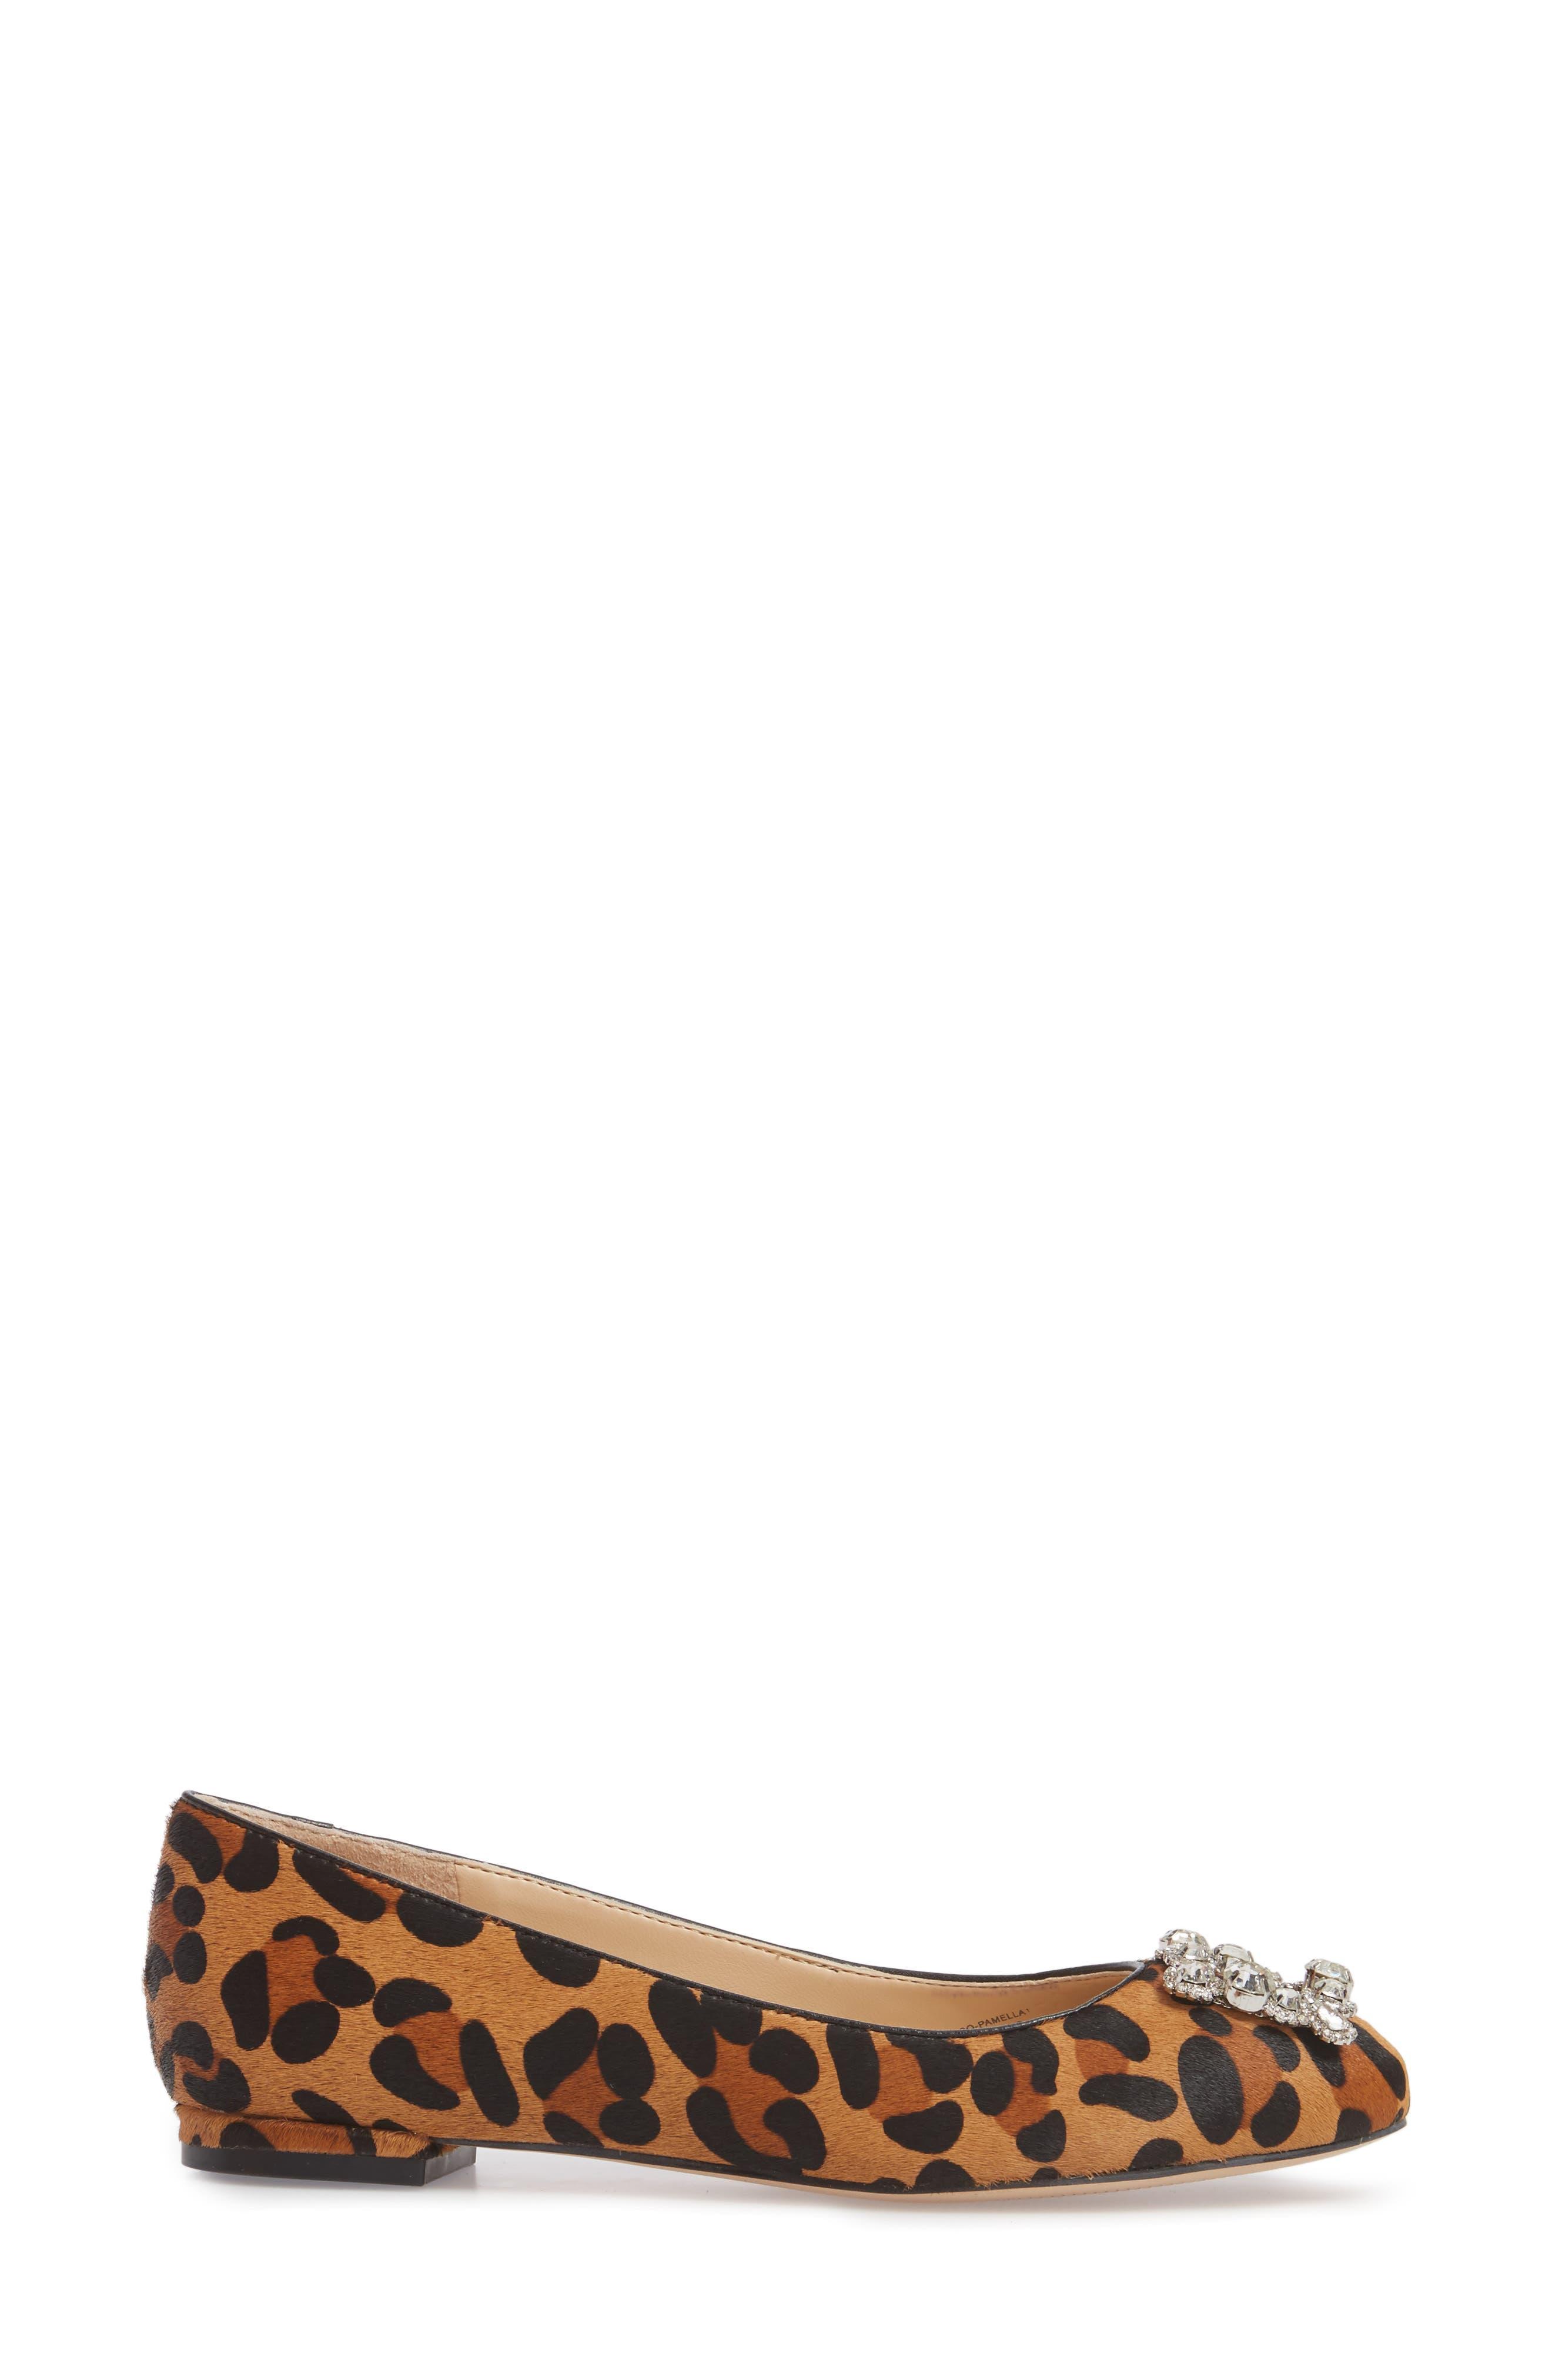 Pamella Ballet Flat,                             Alternate thumbnail 3, color,                             Leopard